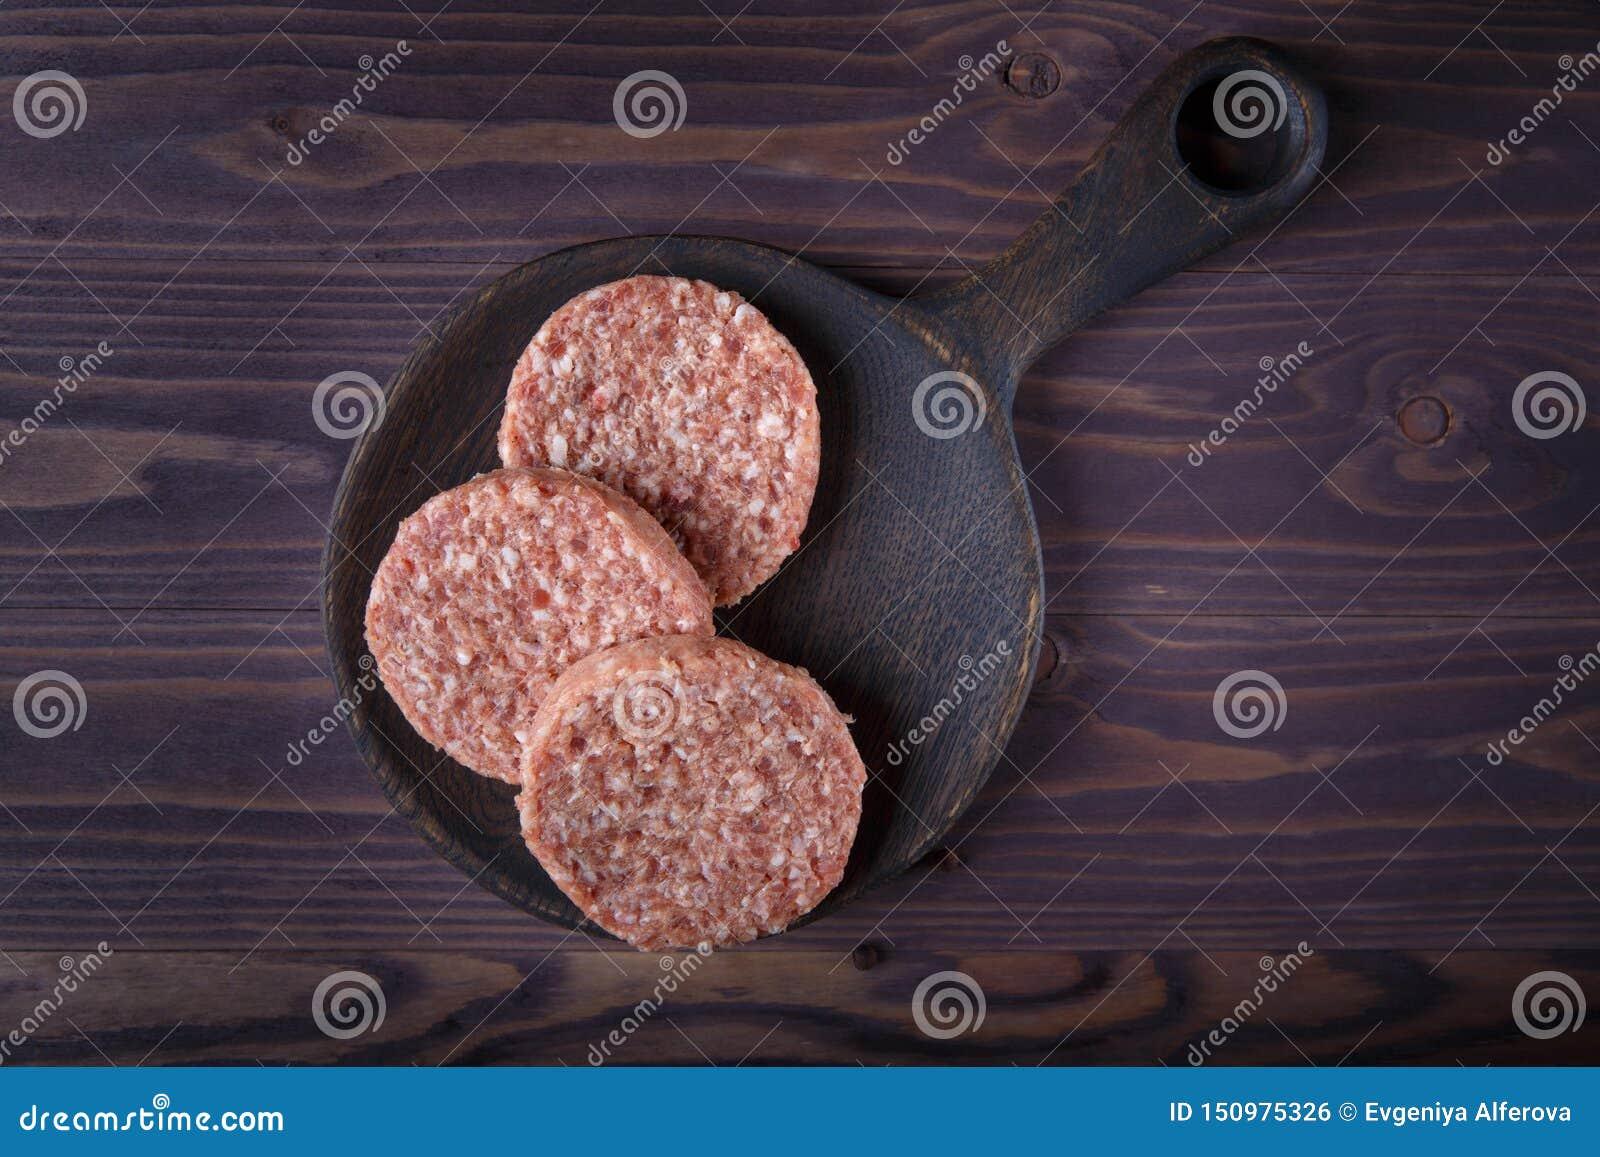 Surowej minced wo?owiny hamburgeru mi??ni cutlets na ciemnym drewnianym tle